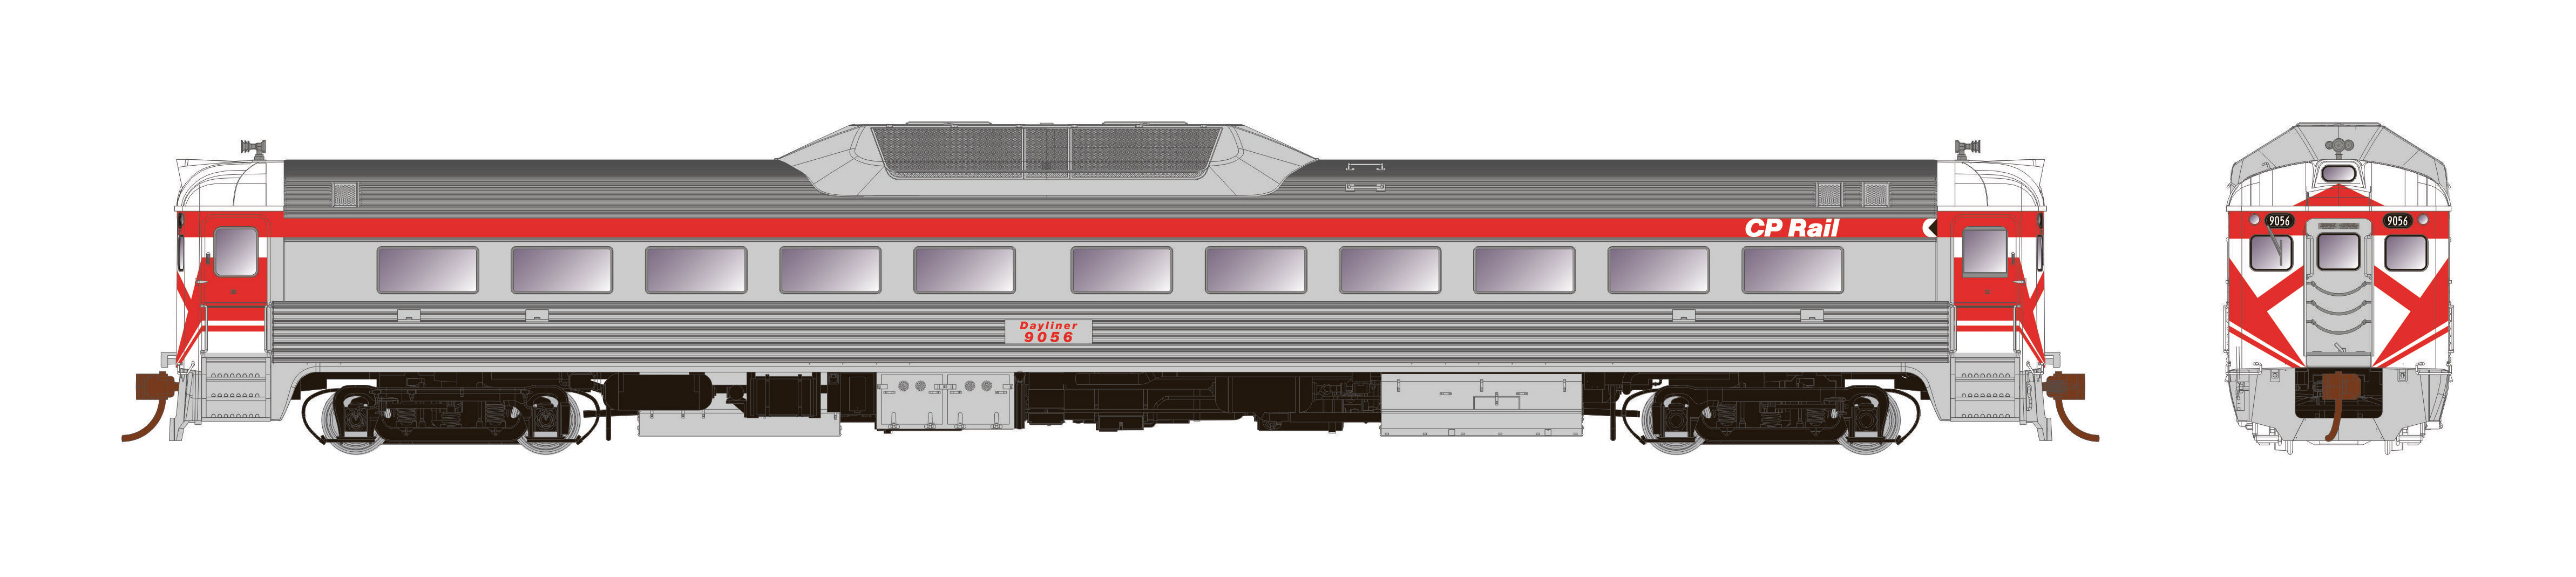 Rapido Trains 16208 - HO Budd RDC-1 - PH2 - DC - CP Rail Unnumbered